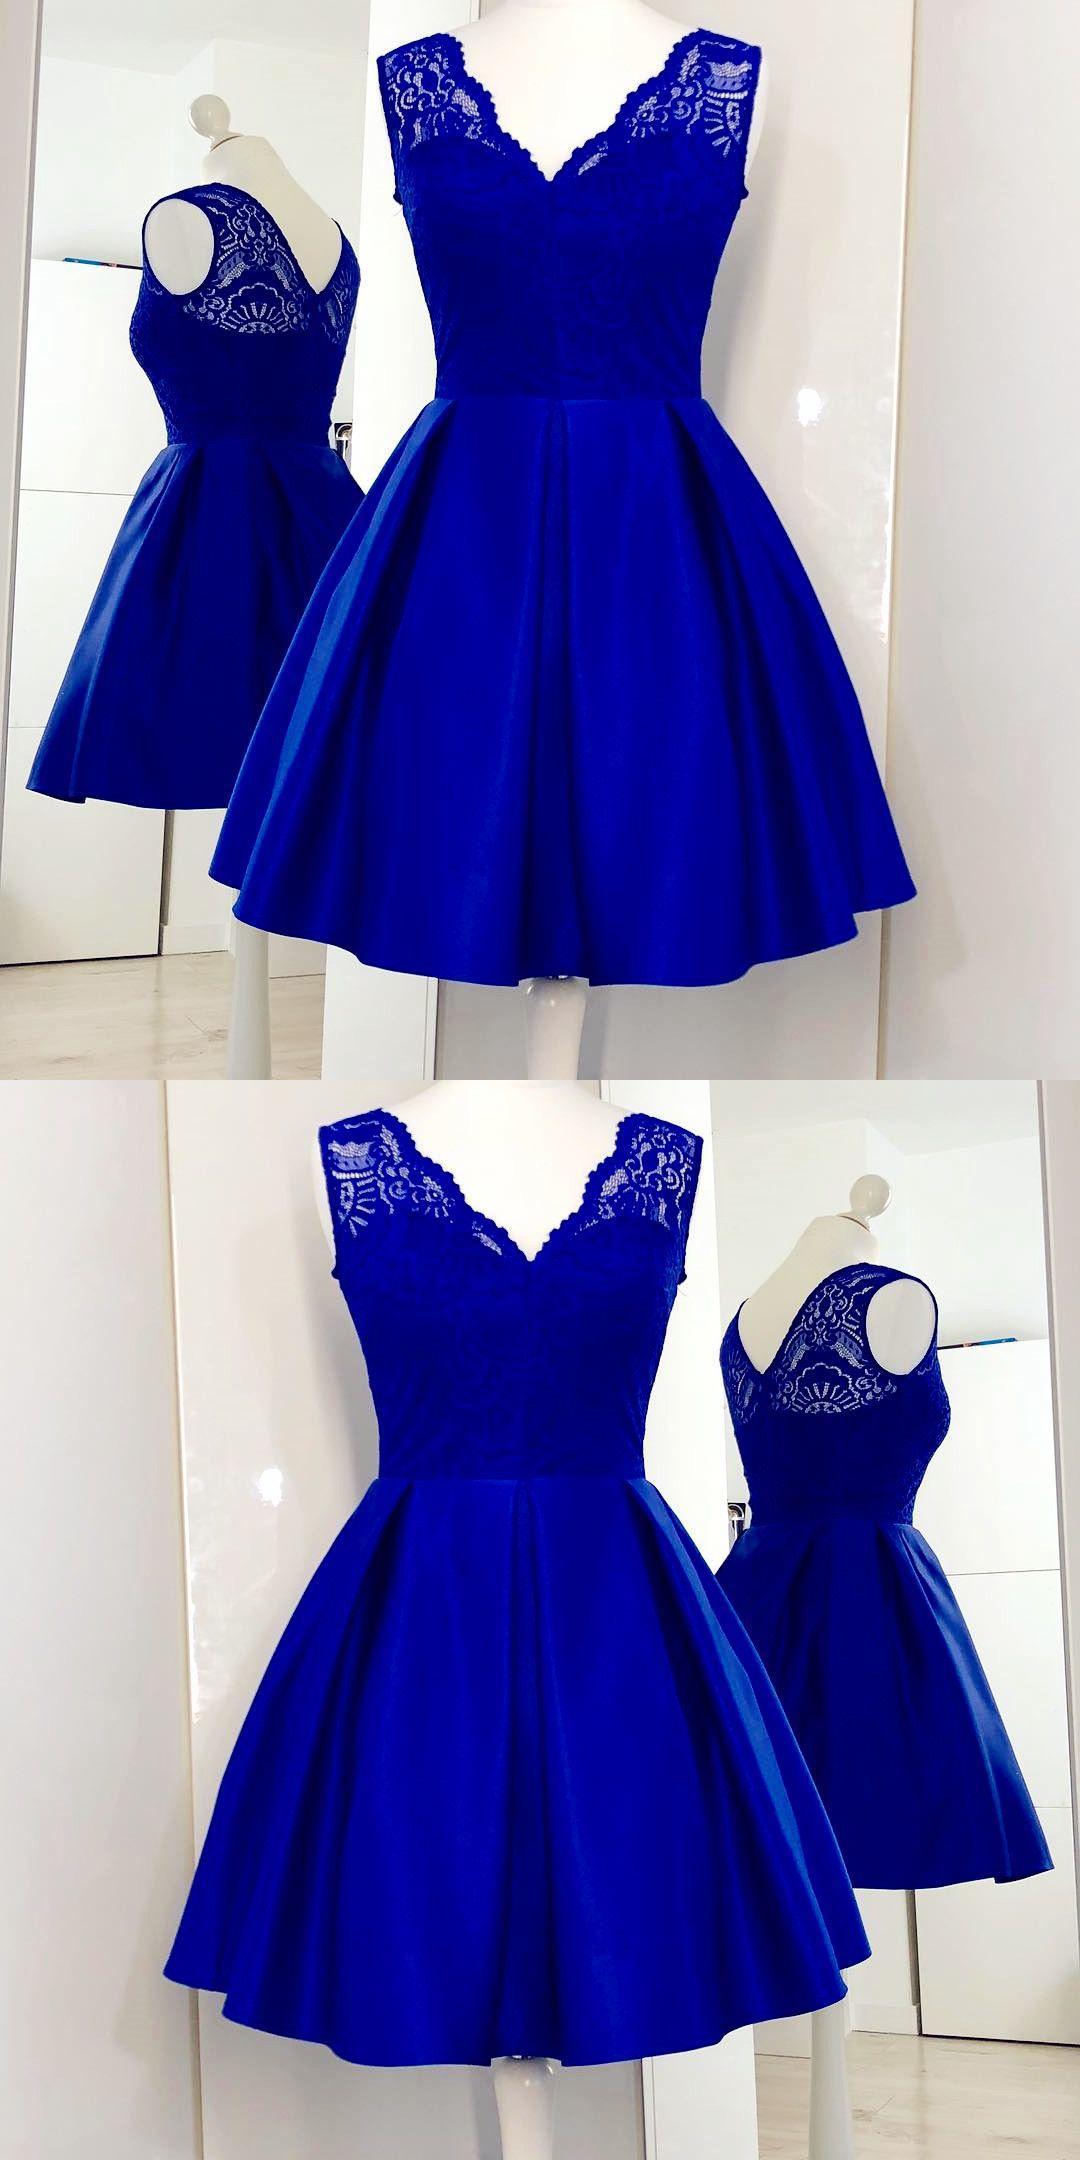 Royal Blue Satin Short Homecoming Dresses with Lace, Elegant